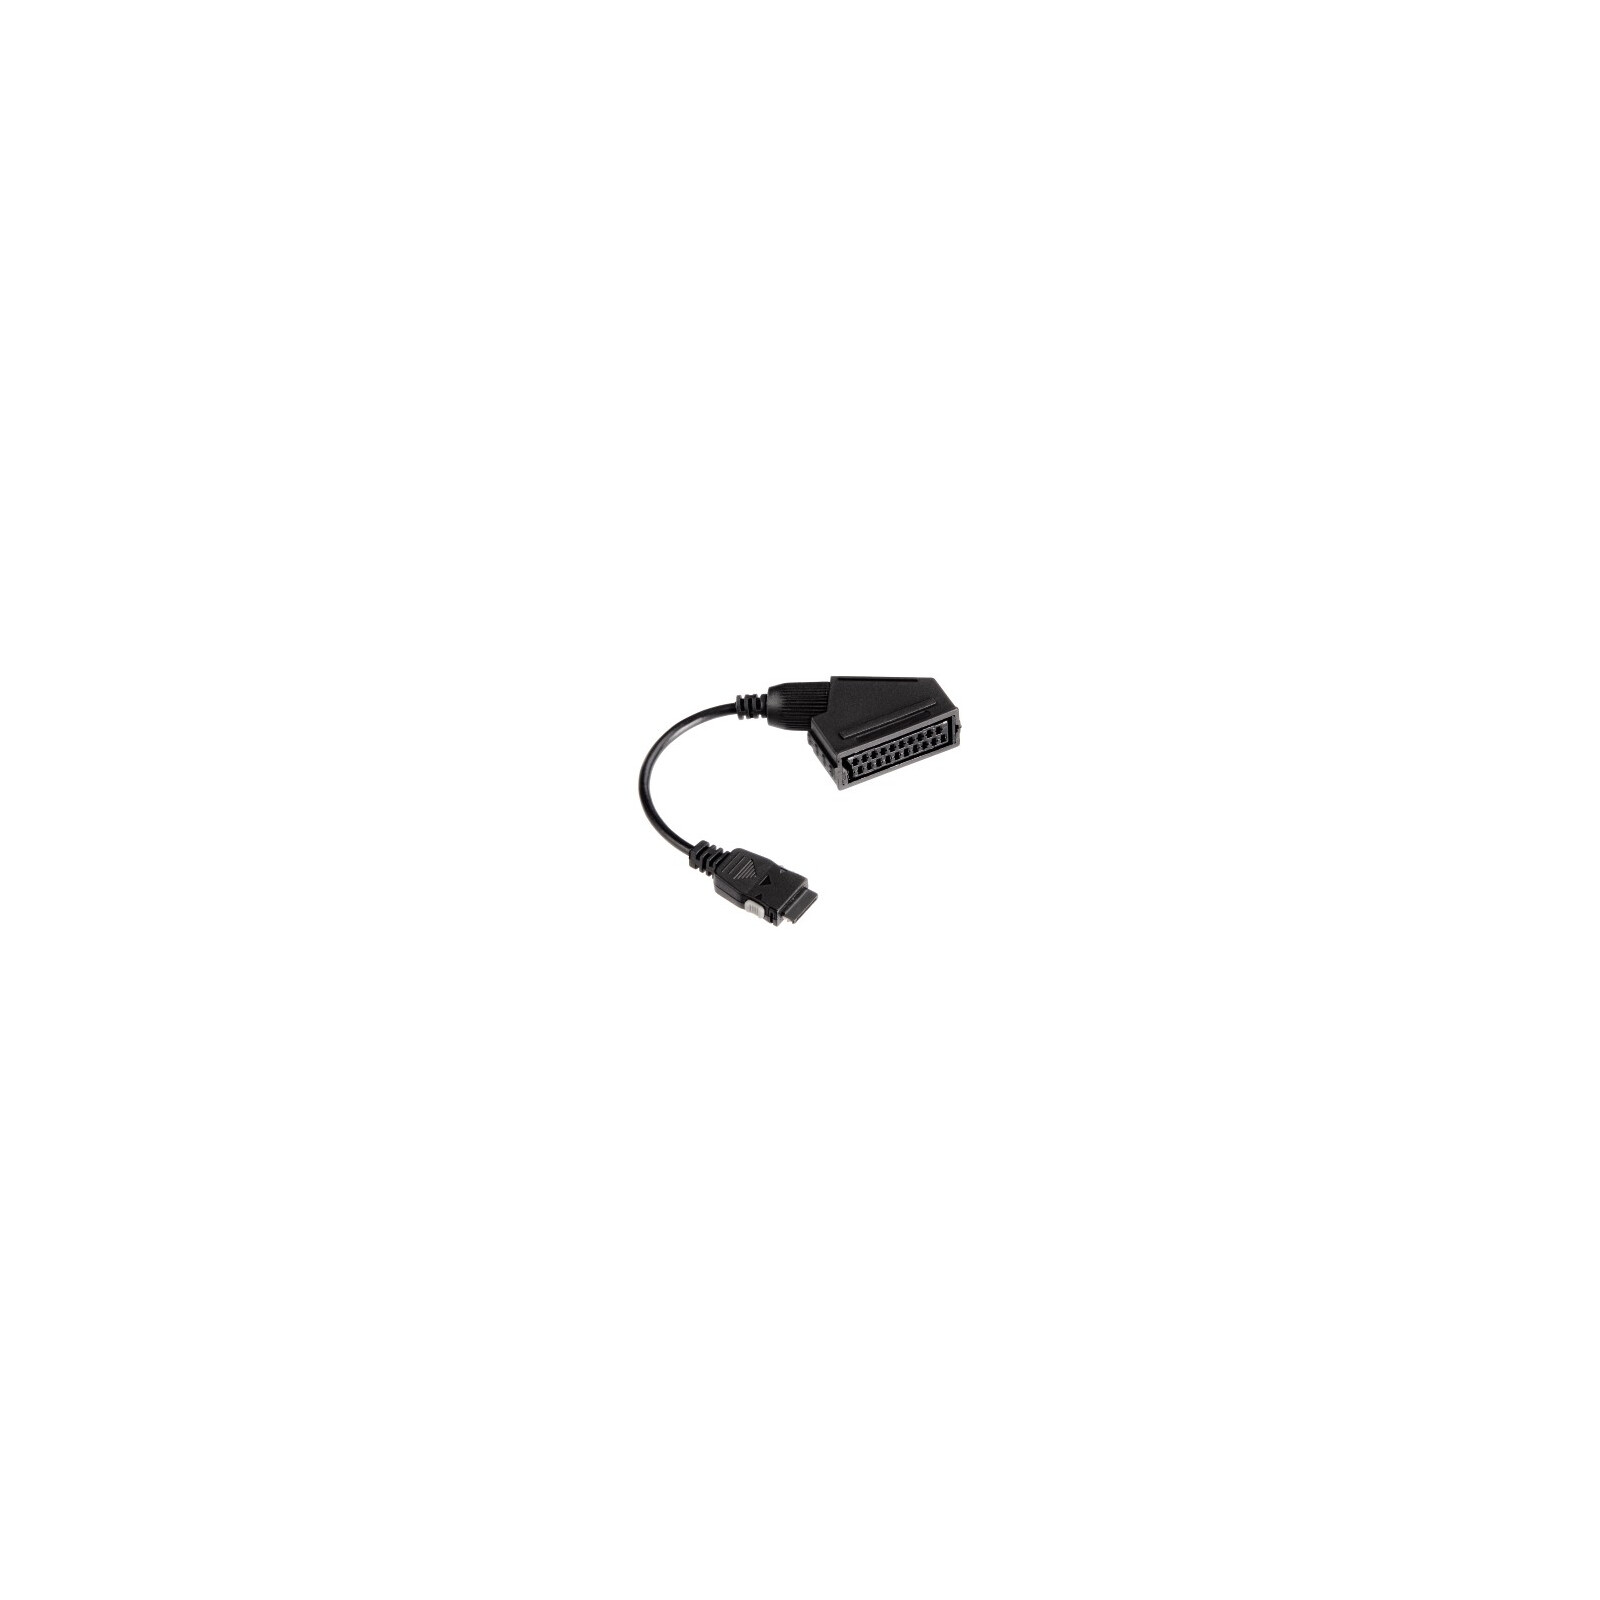 Hama Adapter Scart - Samsung TV